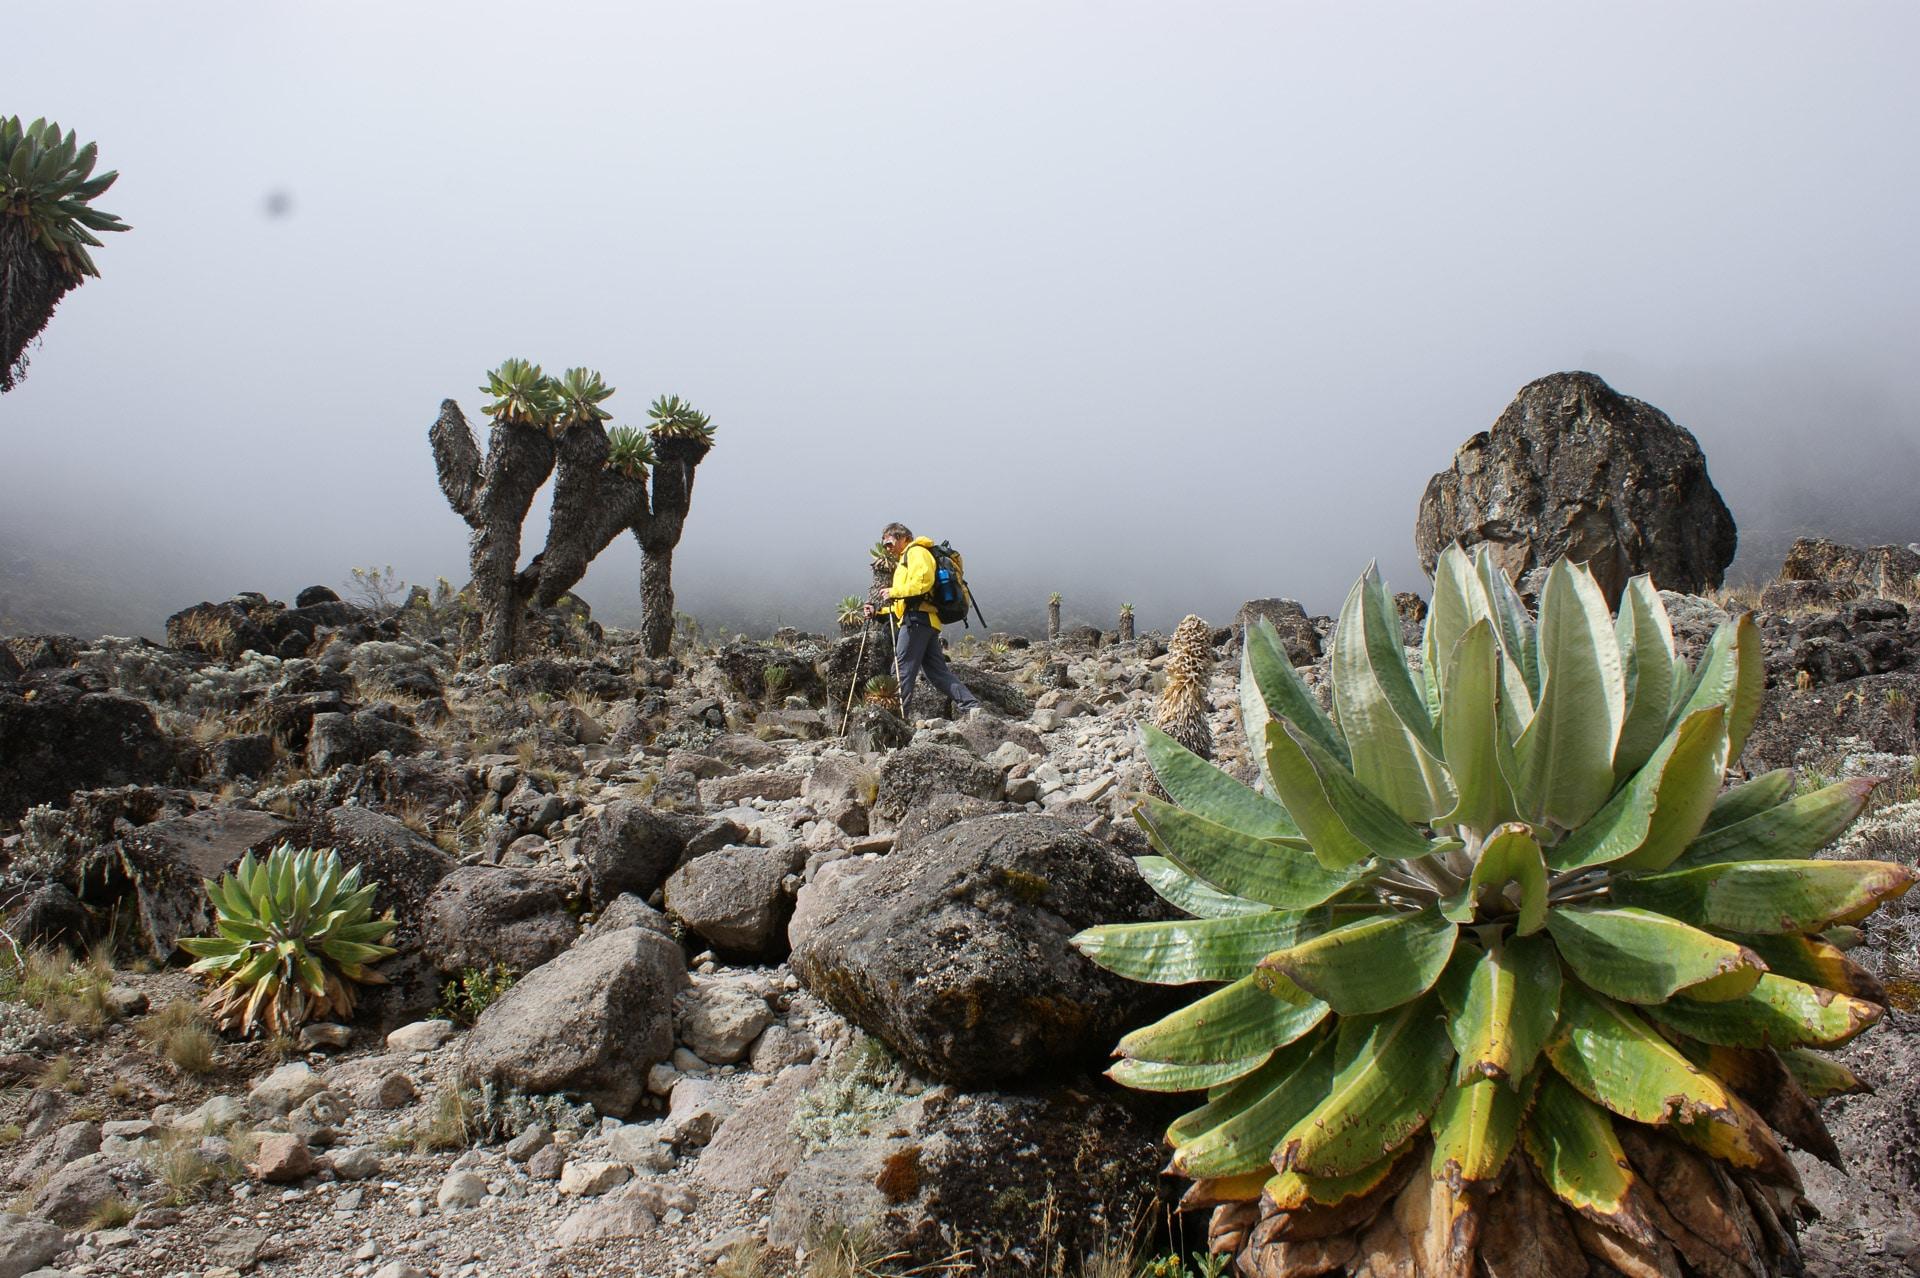 Kilimanjaro-Tansania-Globetrotter-Select-Krause-06